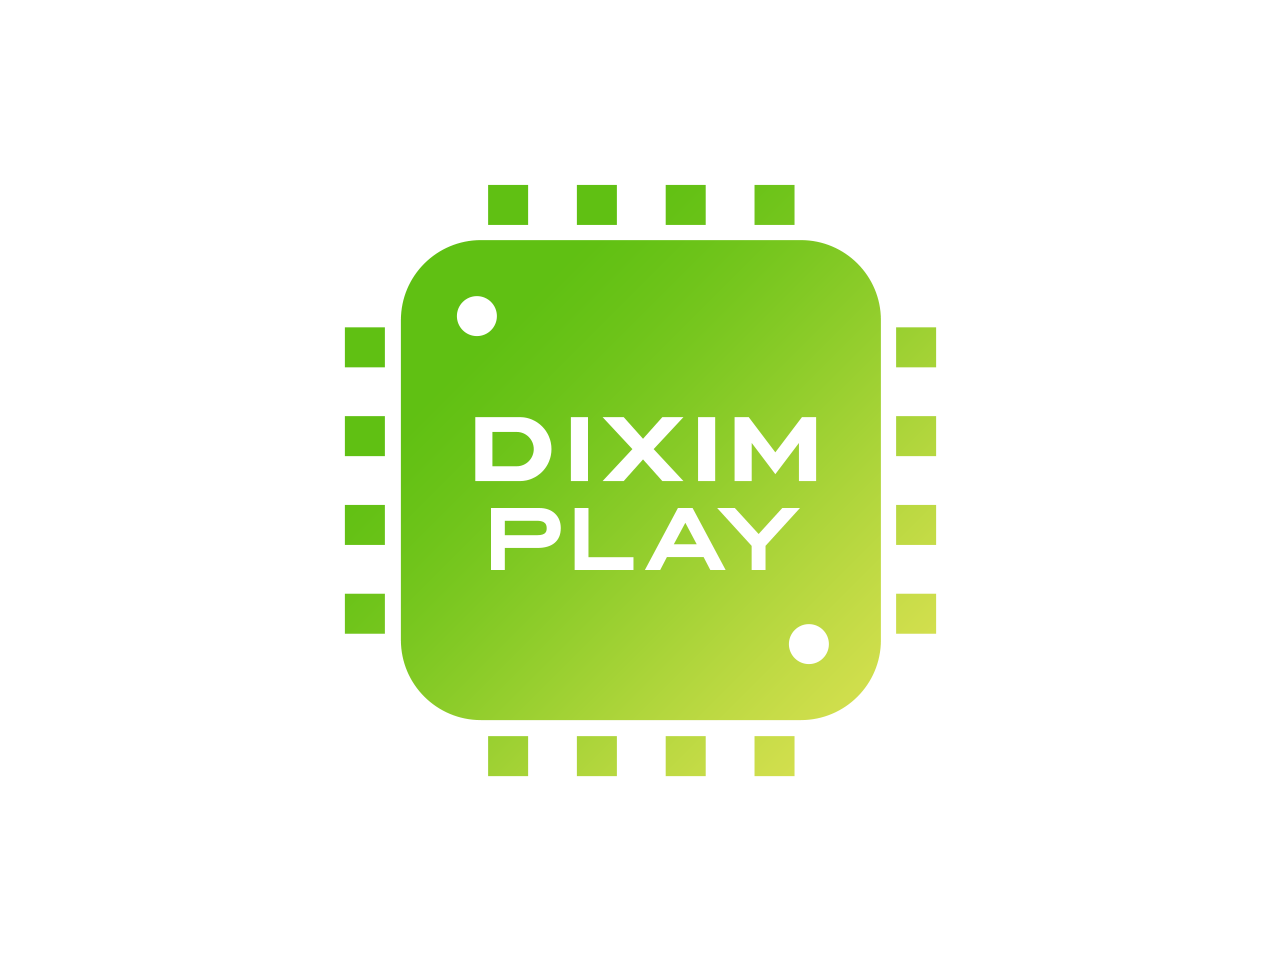 ca55e09376 Android OS向け DiXiM Play Enterprise Edition - 導入事例 | 製品情報 | DigiOn